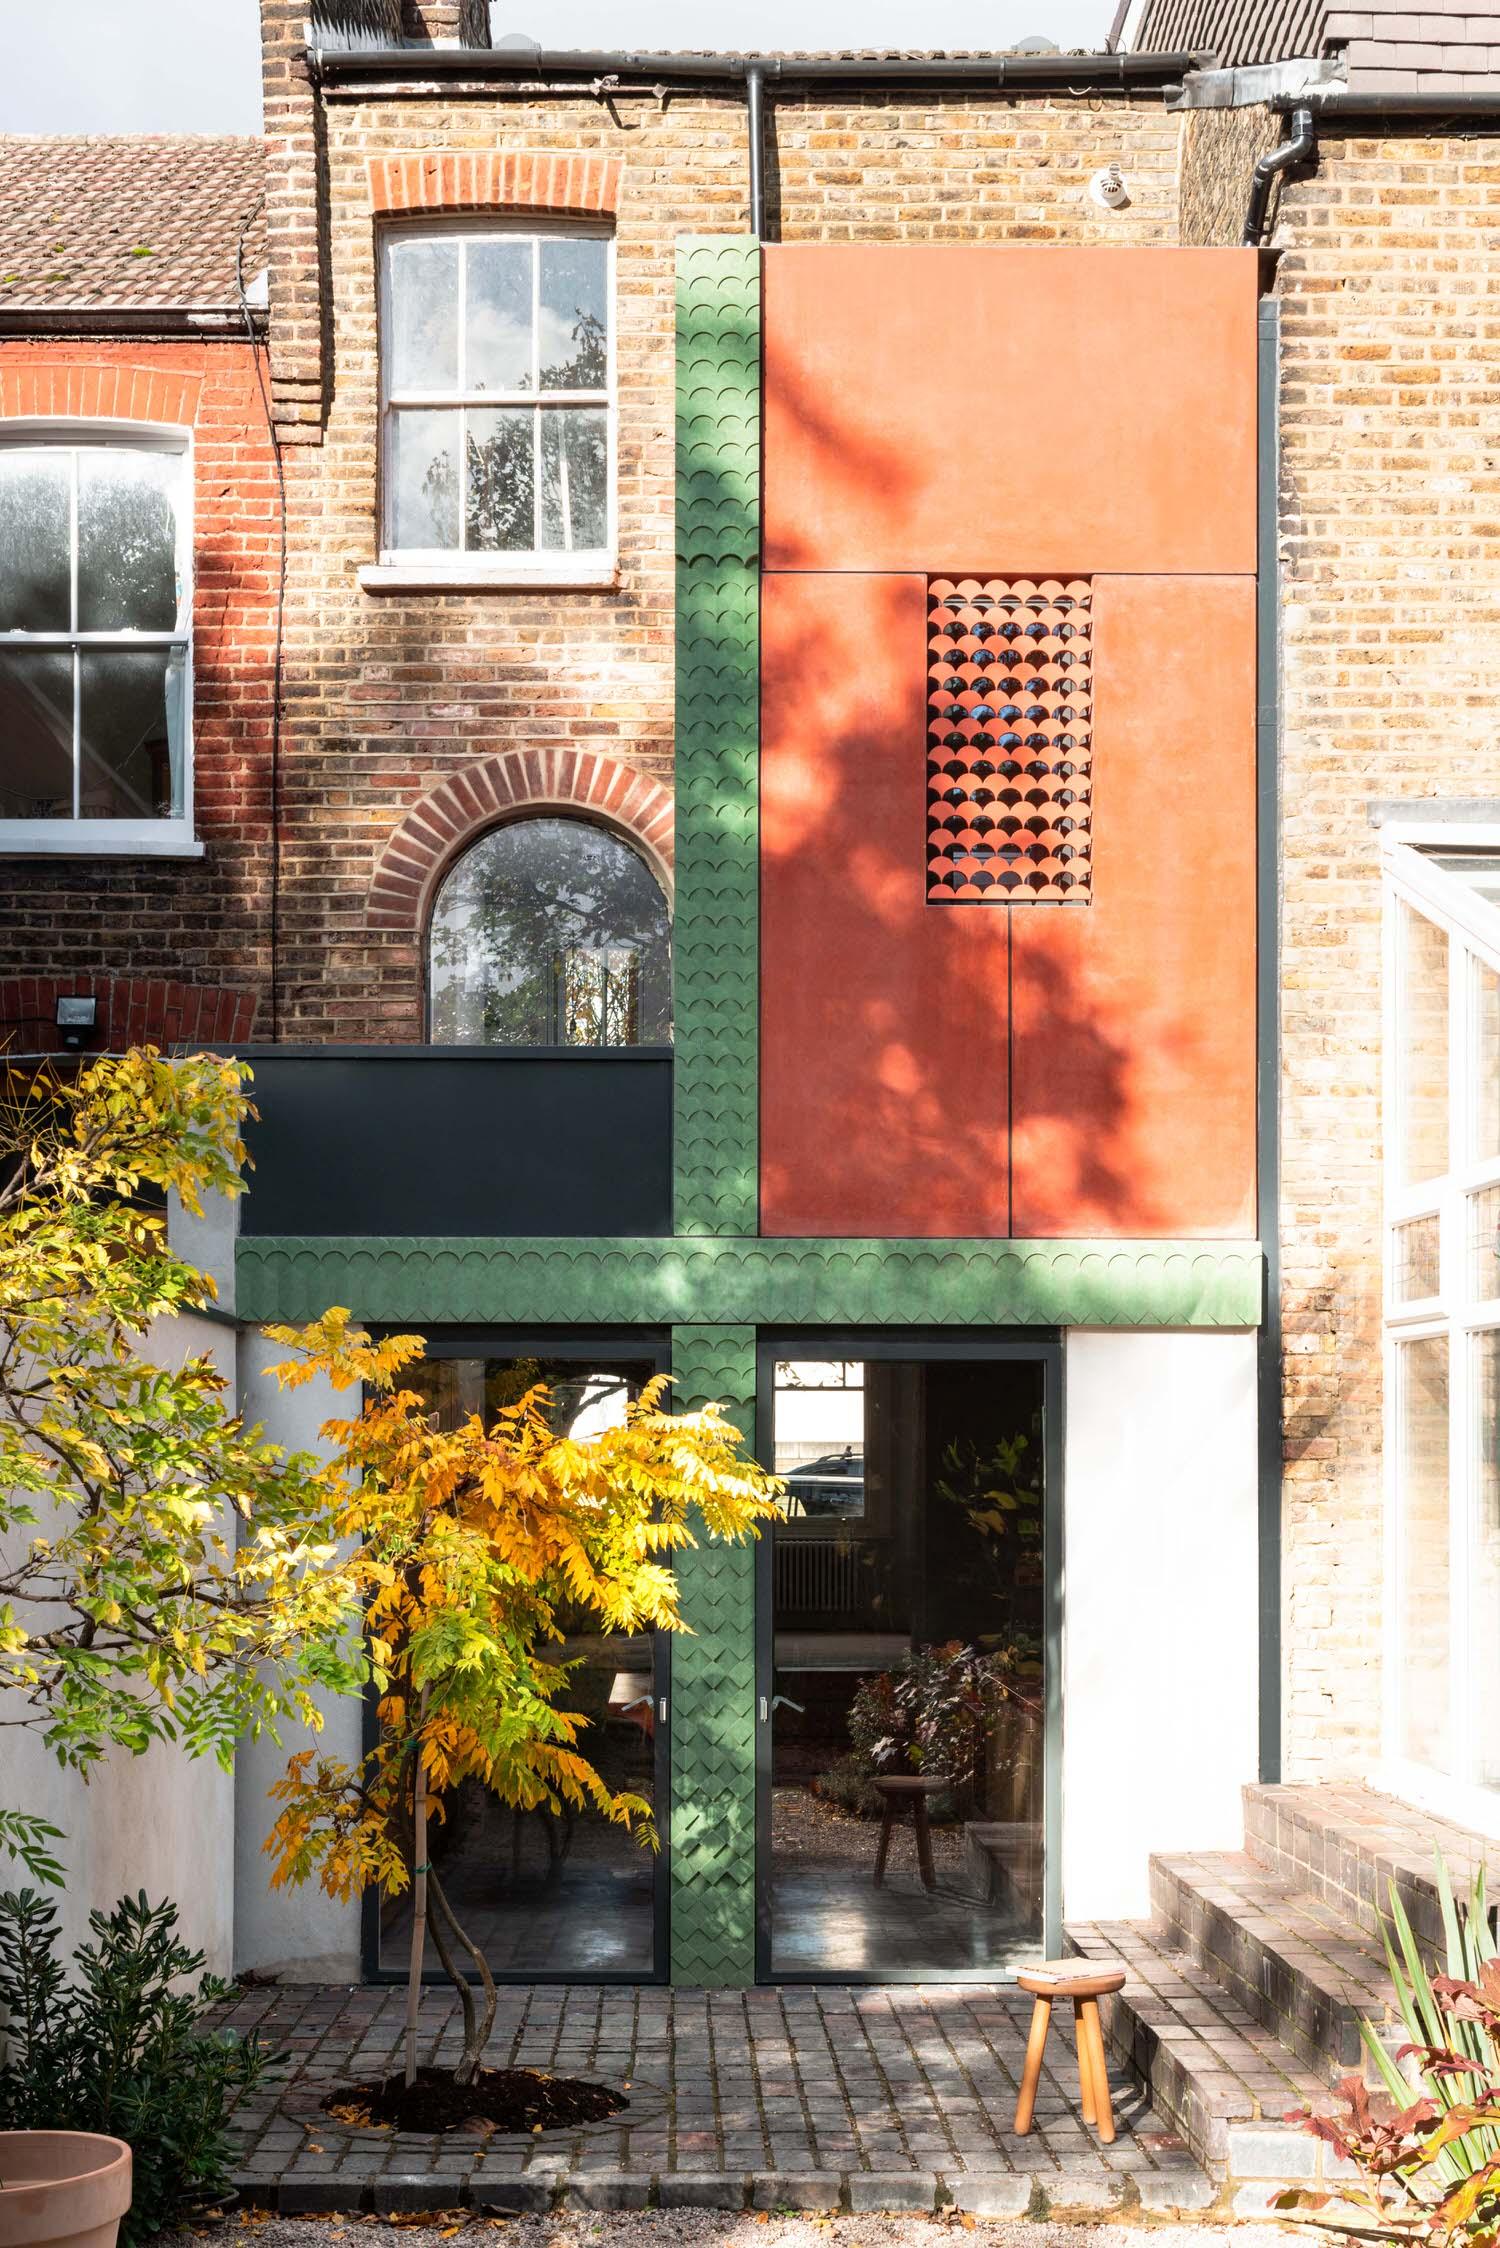 Studio Ben Allen House Recast London Residential Architecture Photo French+tye Yellowtrace 10